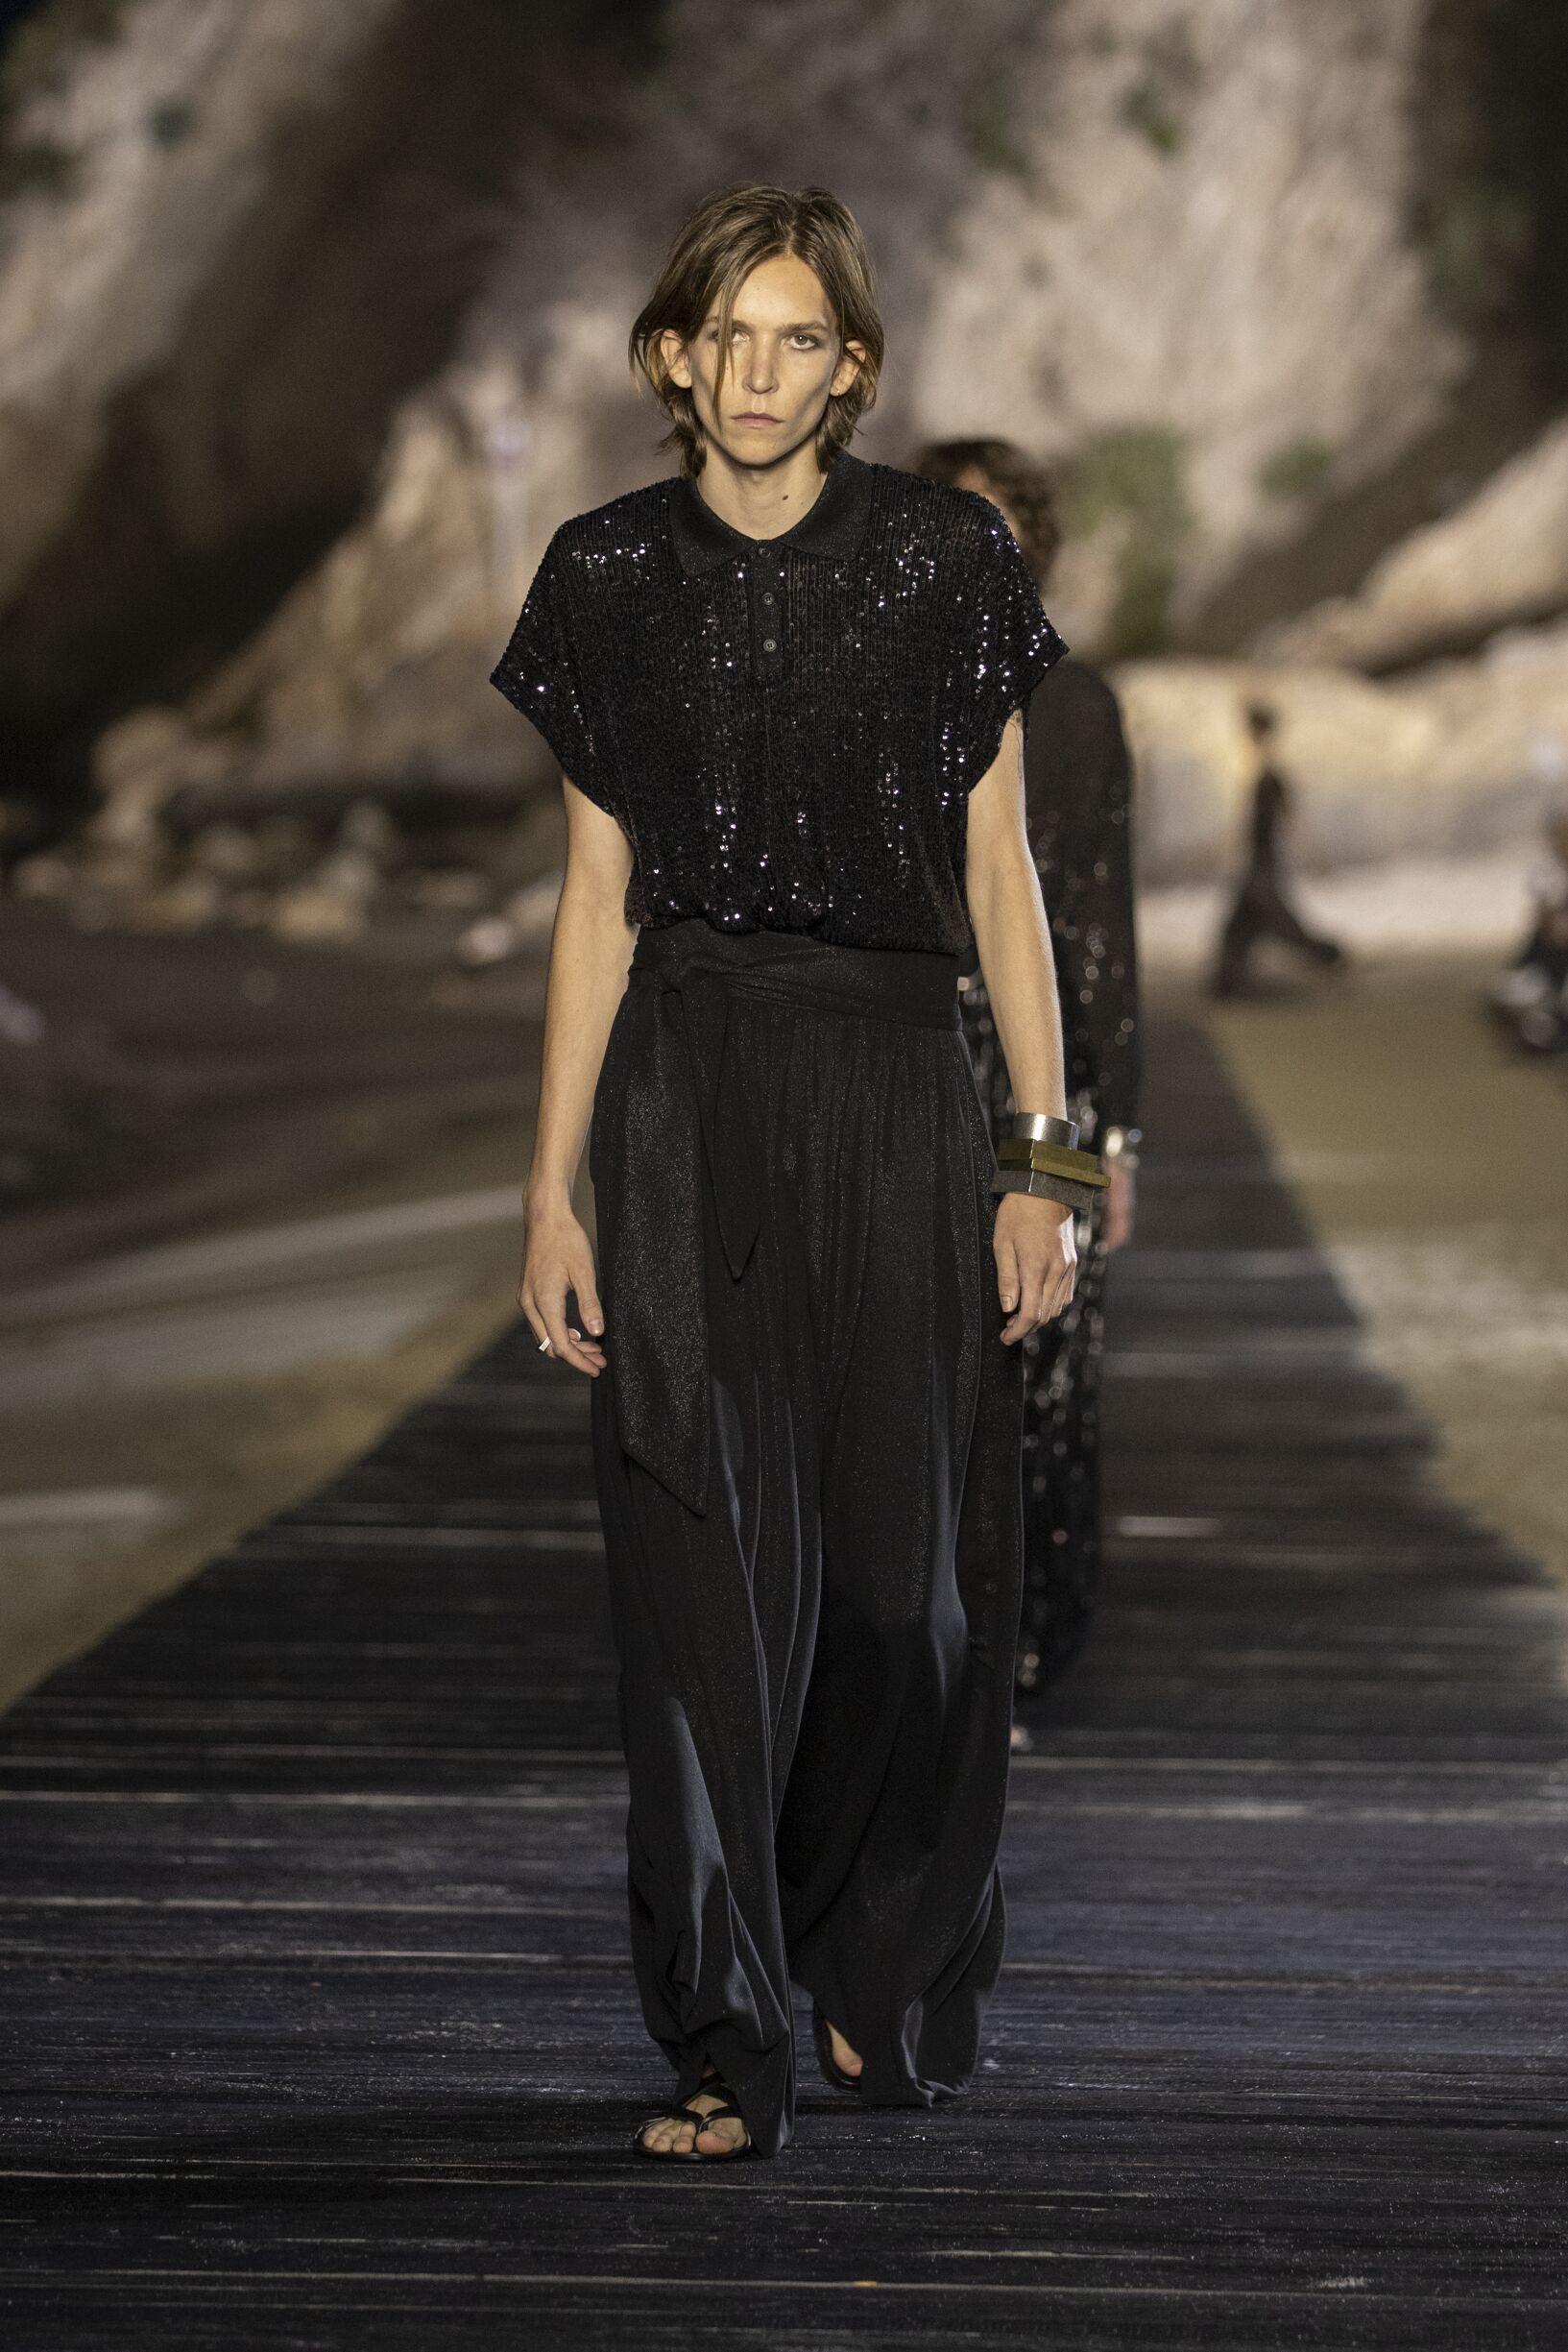 Saint Laurent Menswear Collection Trends Summer